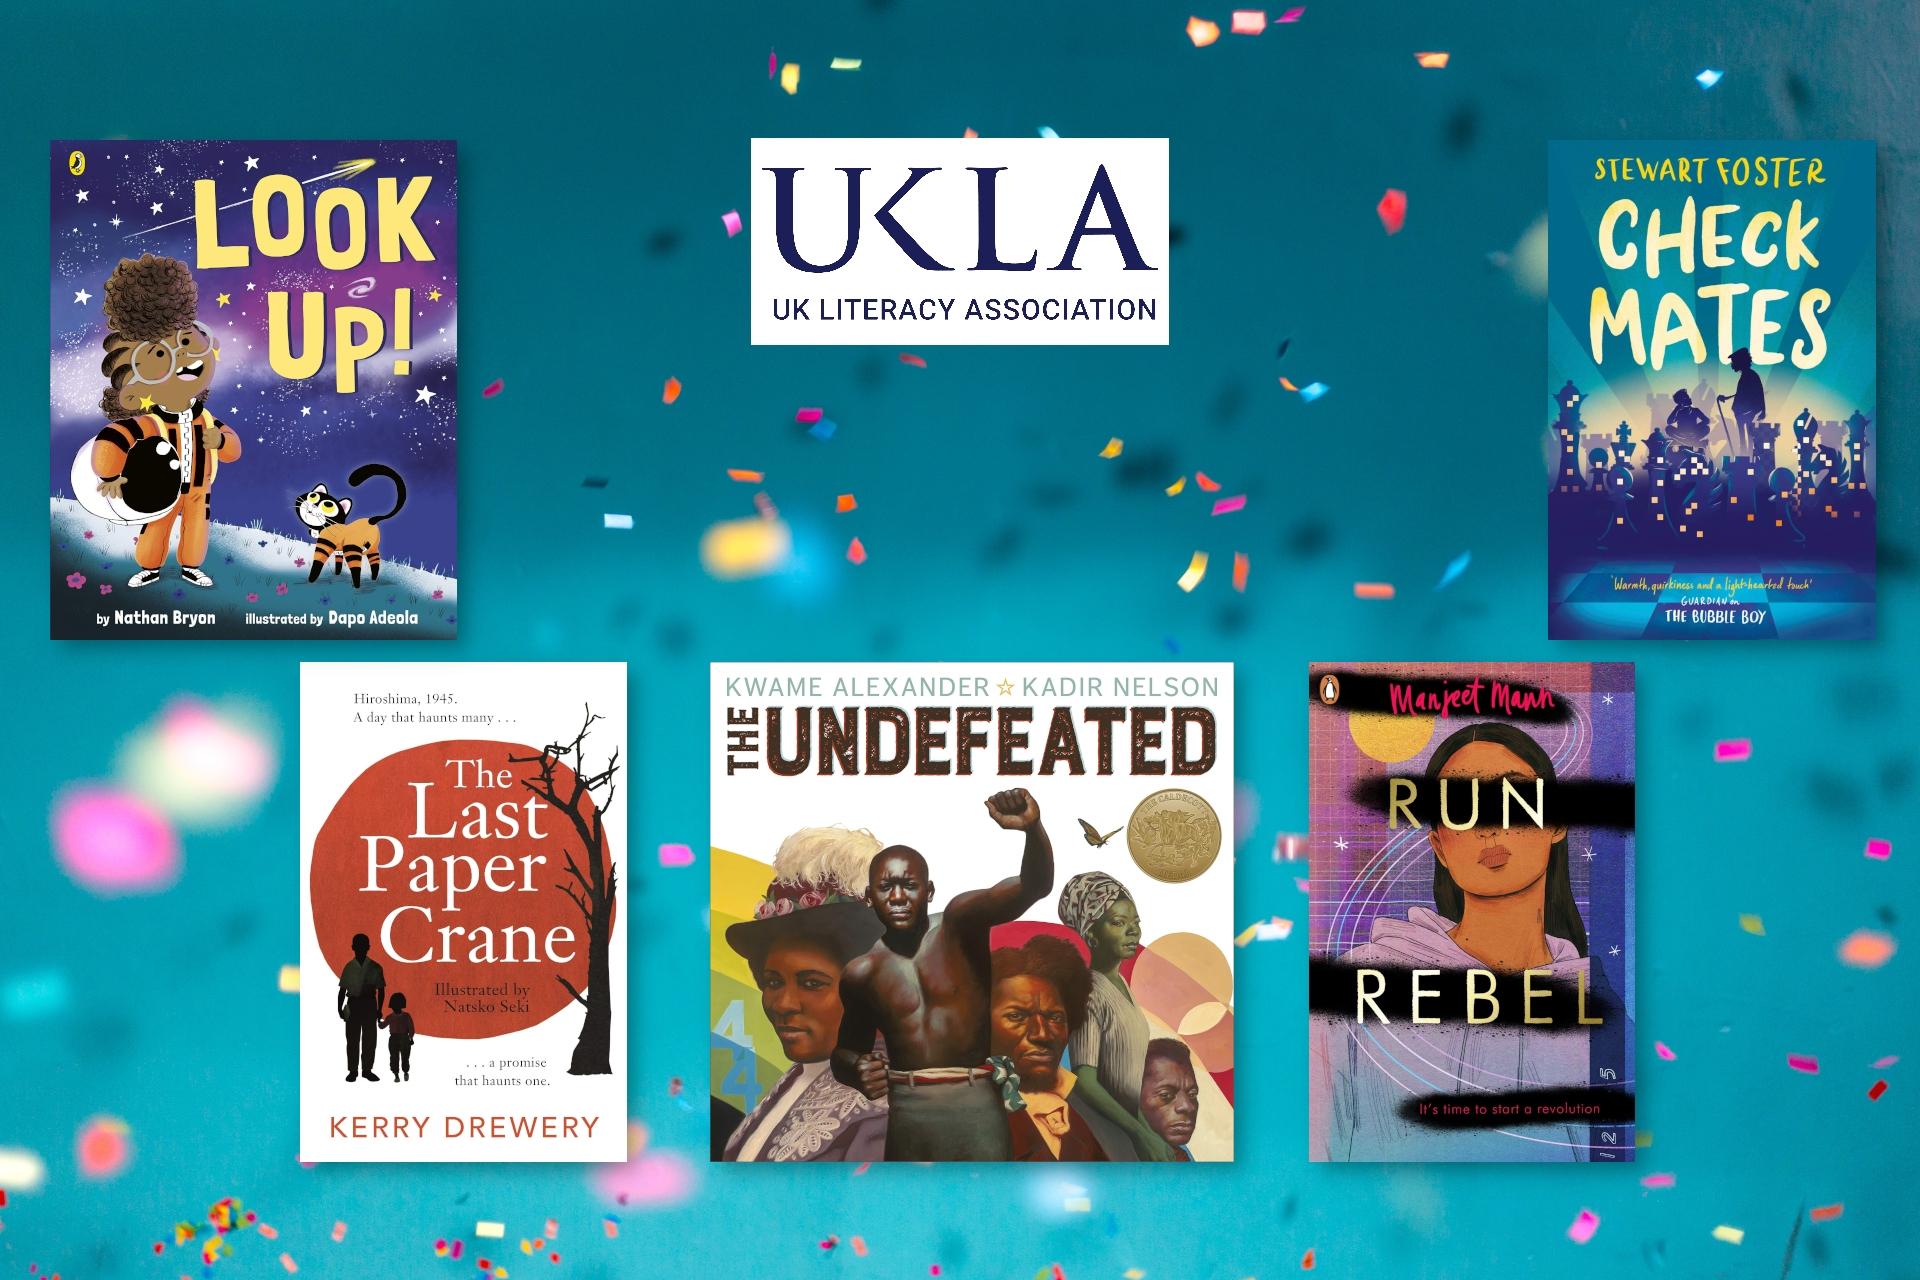 2021 UKLA Awards Winners Announced